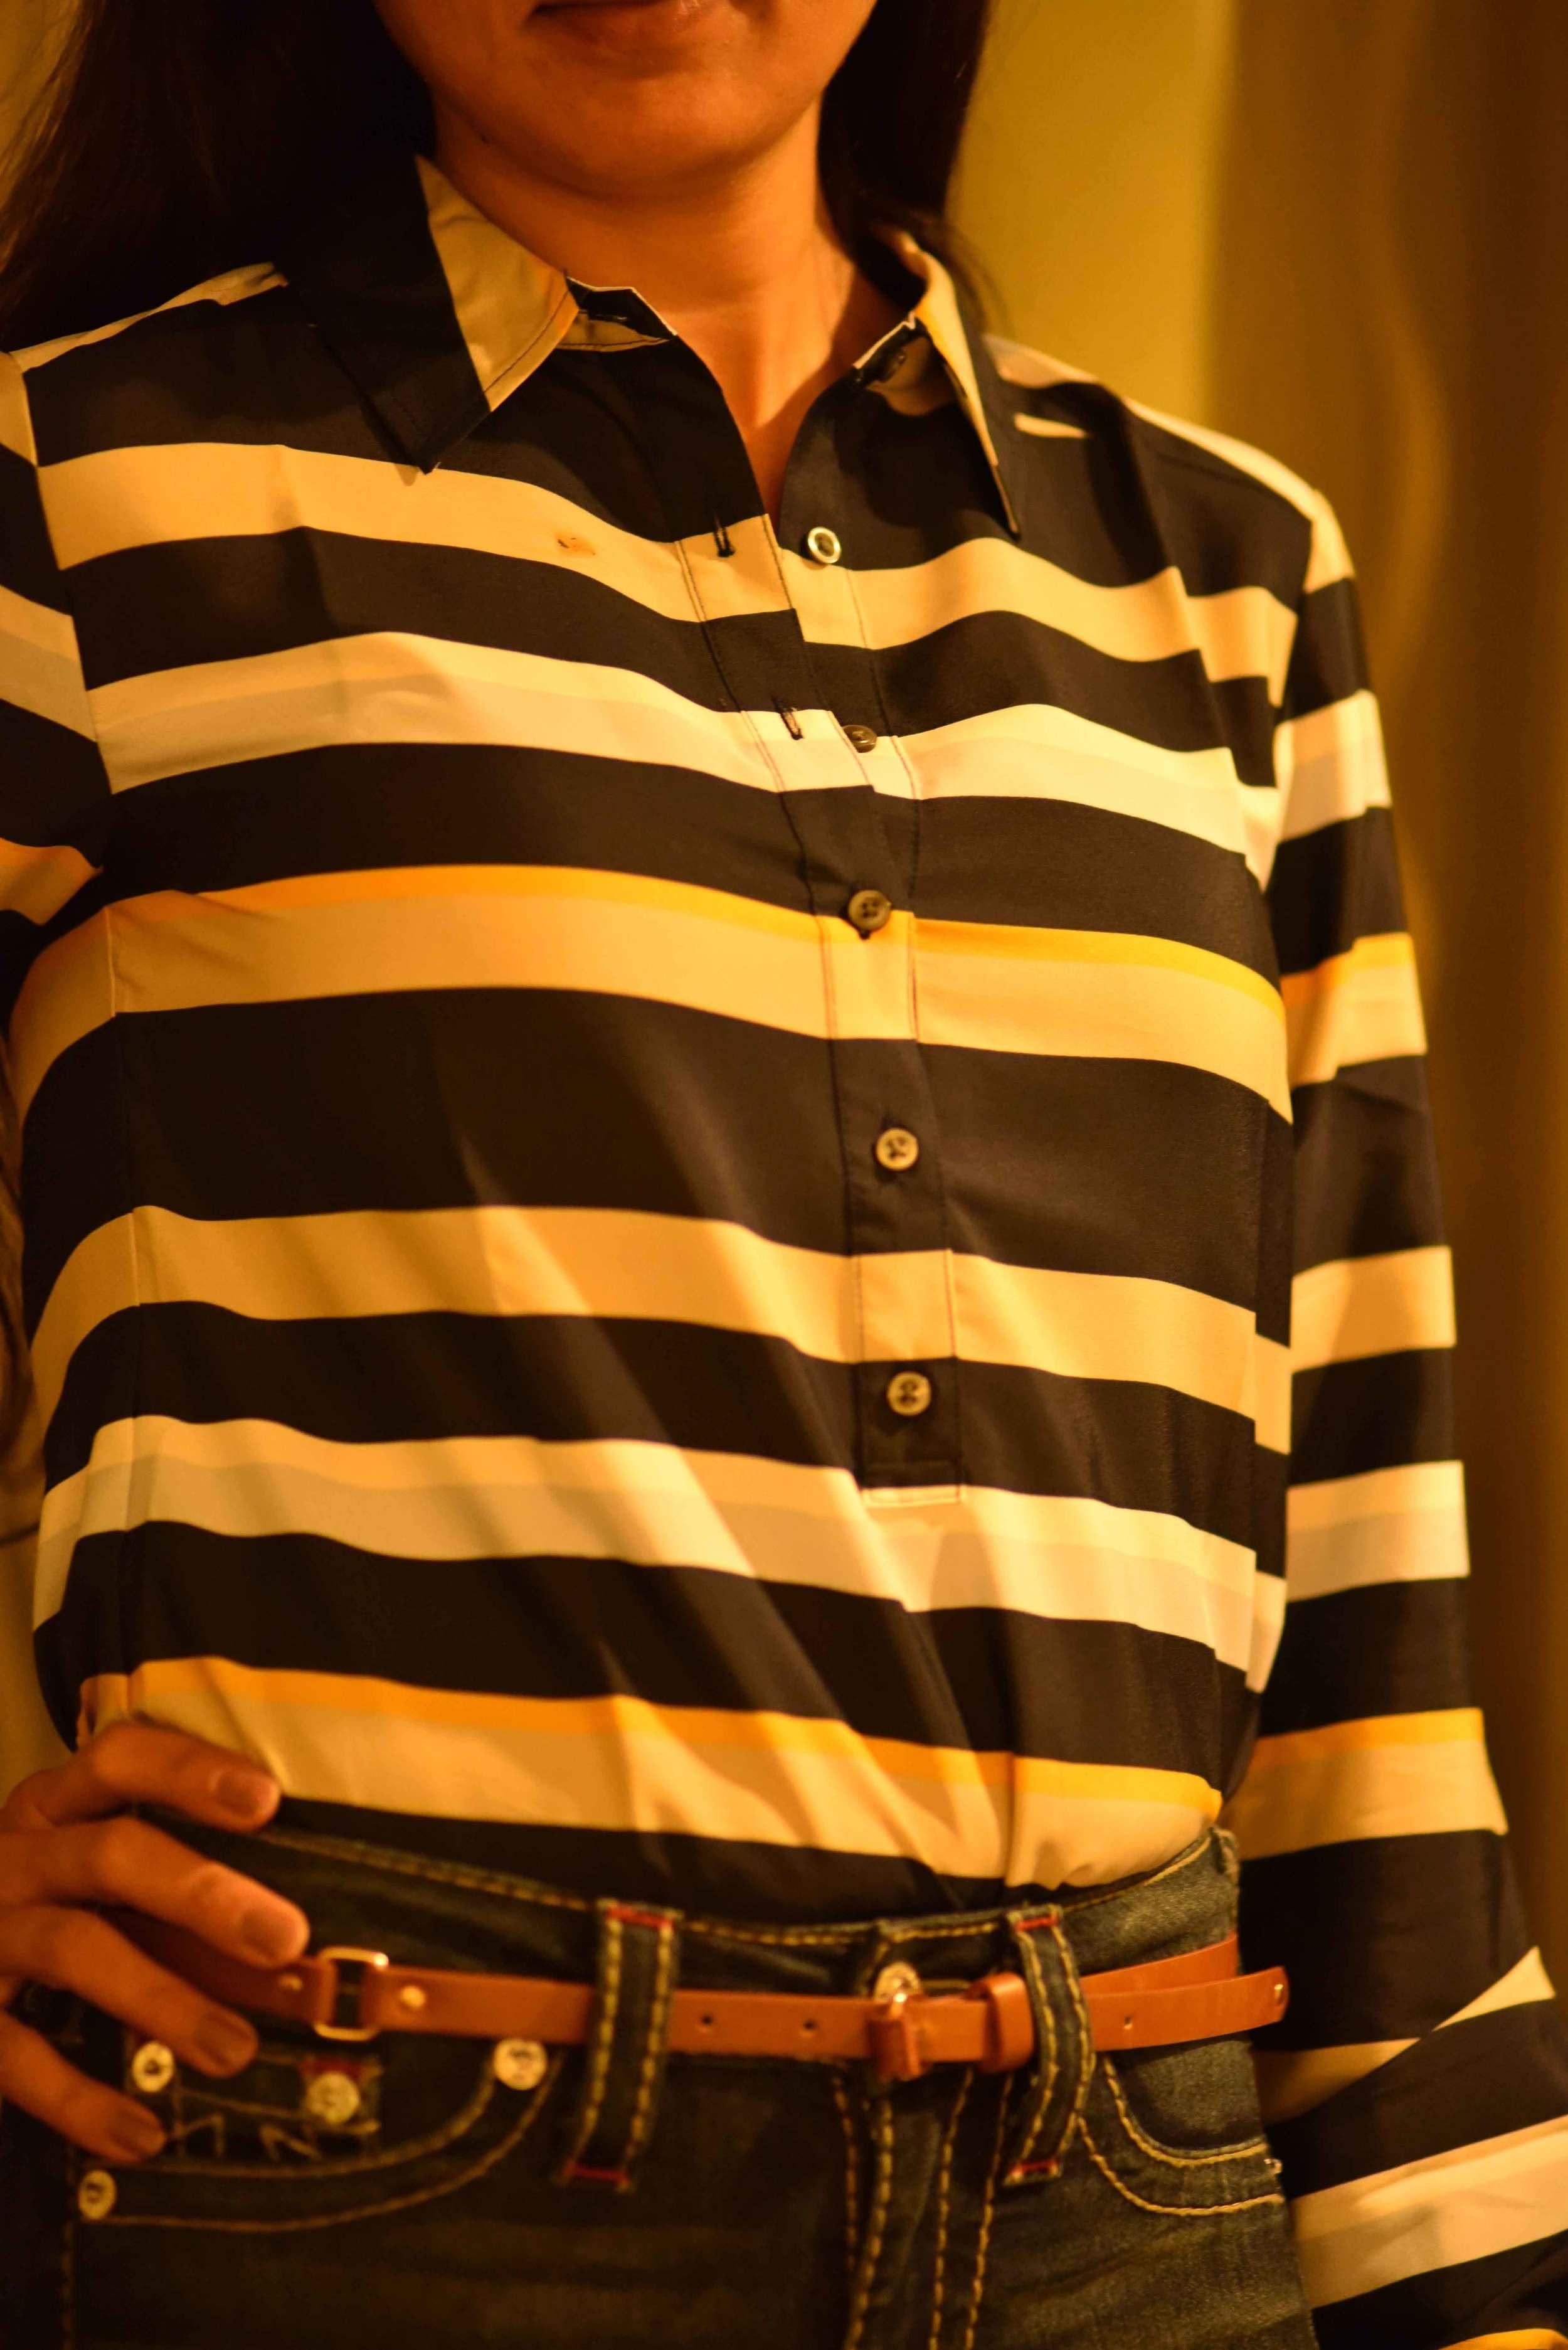 True Religion jean leggings with an Ann Taylor striped top. Image©gunjanvirk